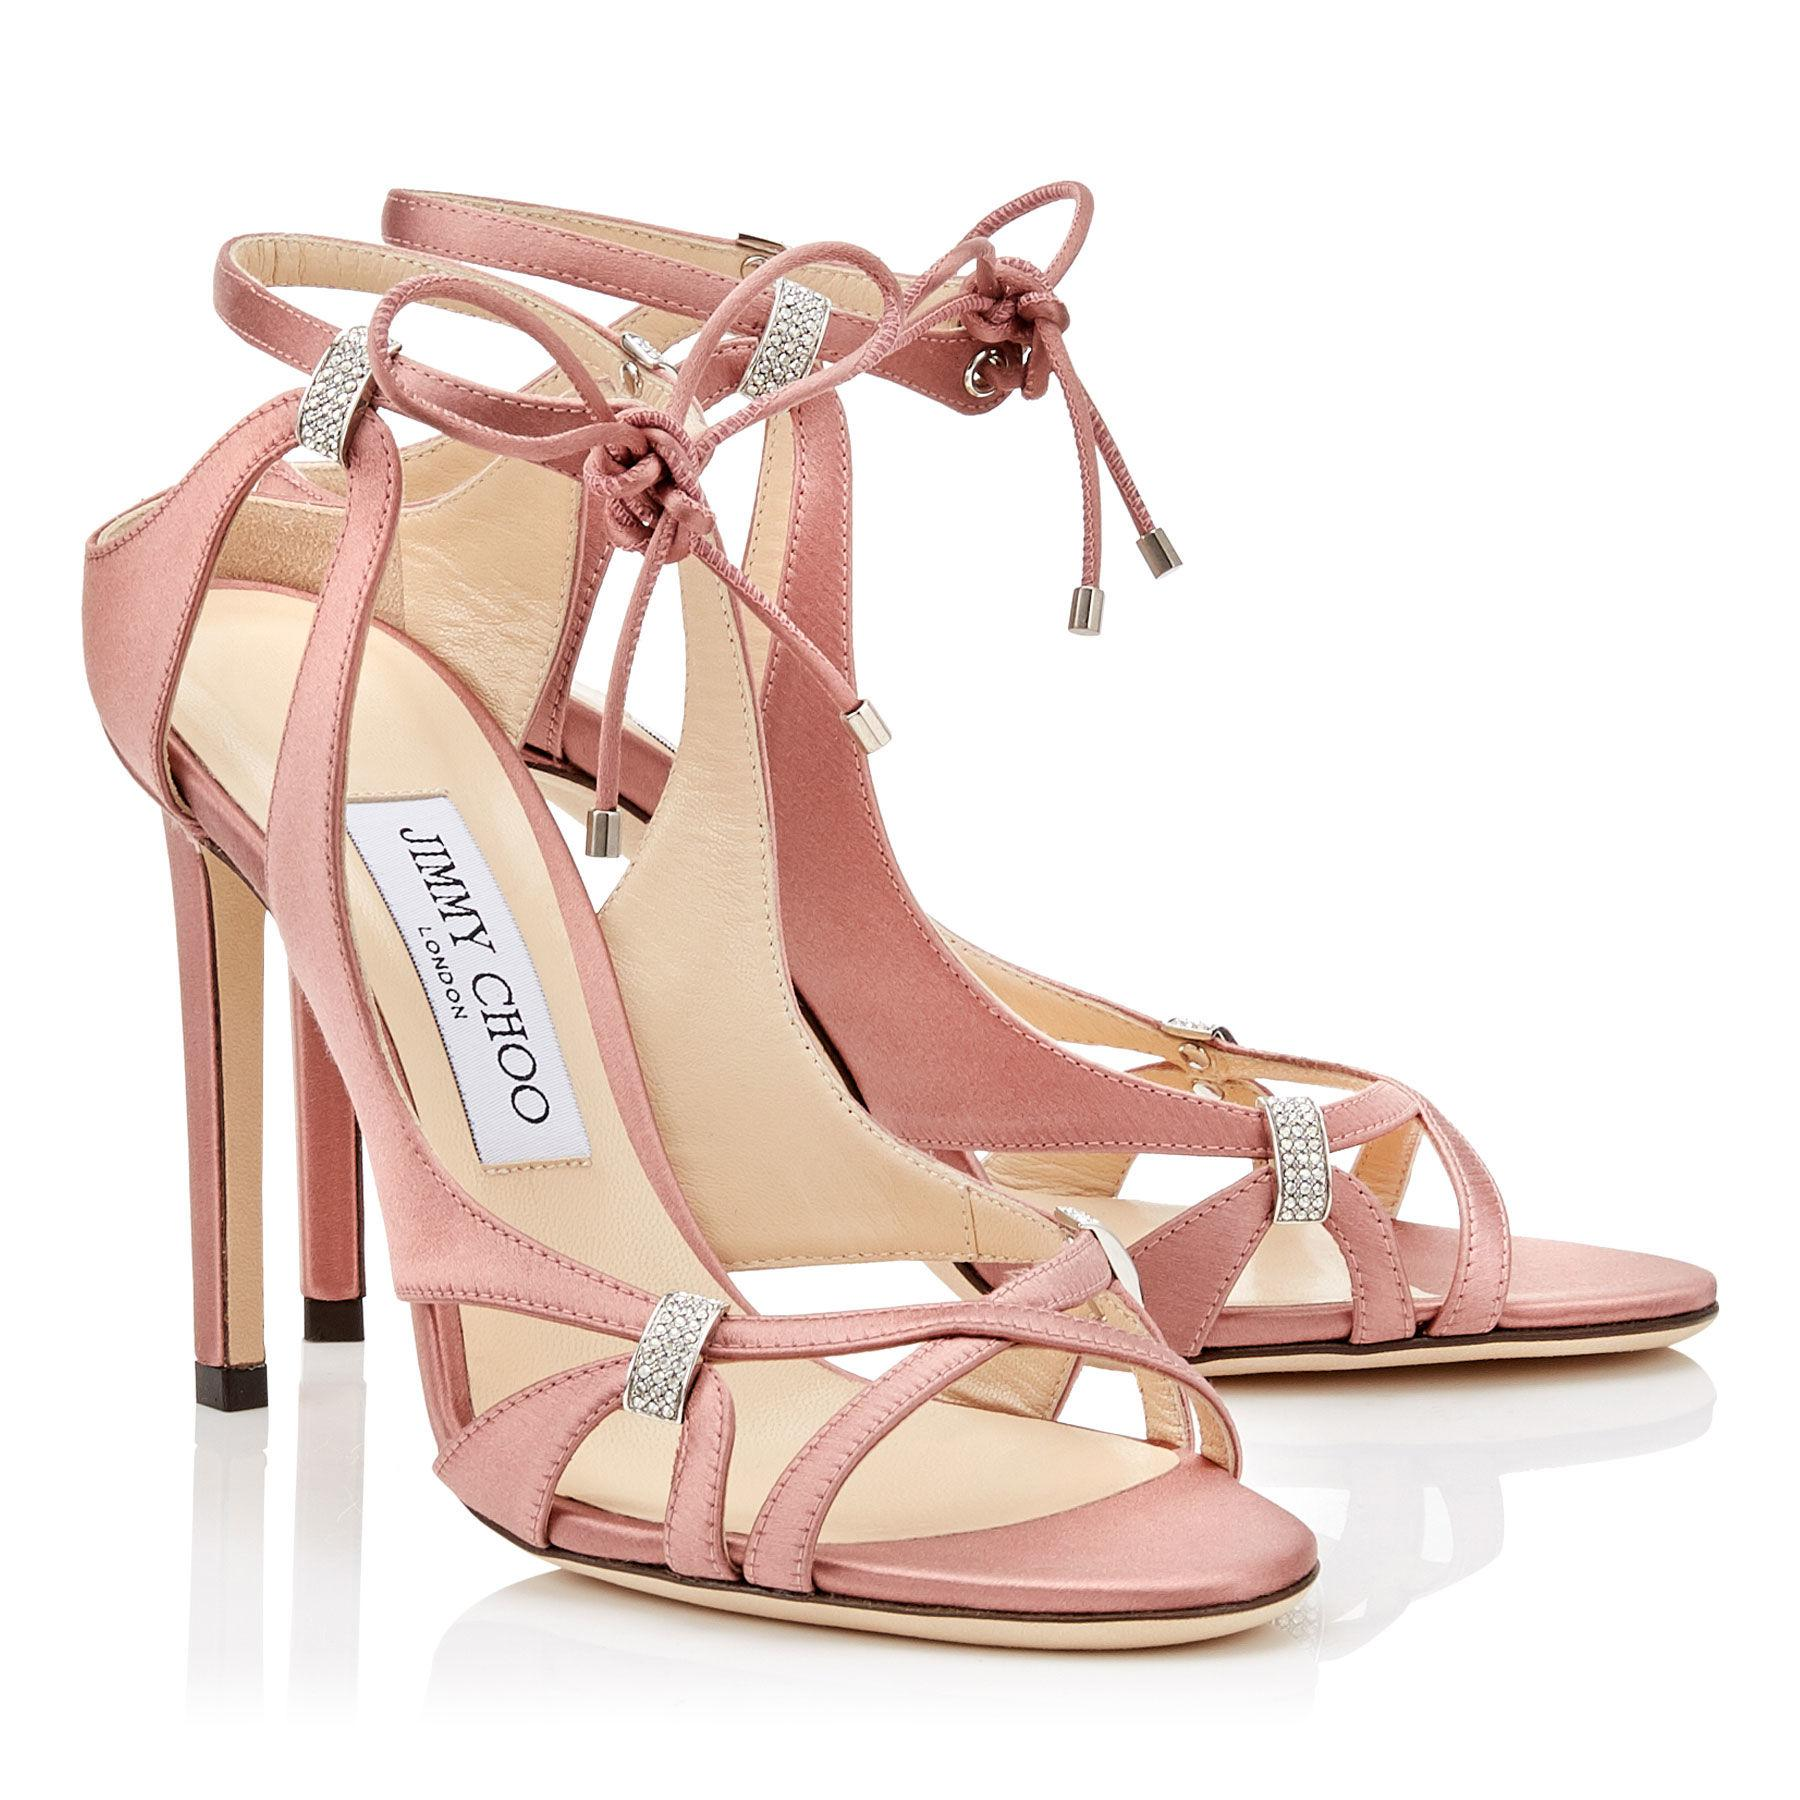 5dd8864f88e736 Lyst - Jimmy Choo Thassia 100 in Pink